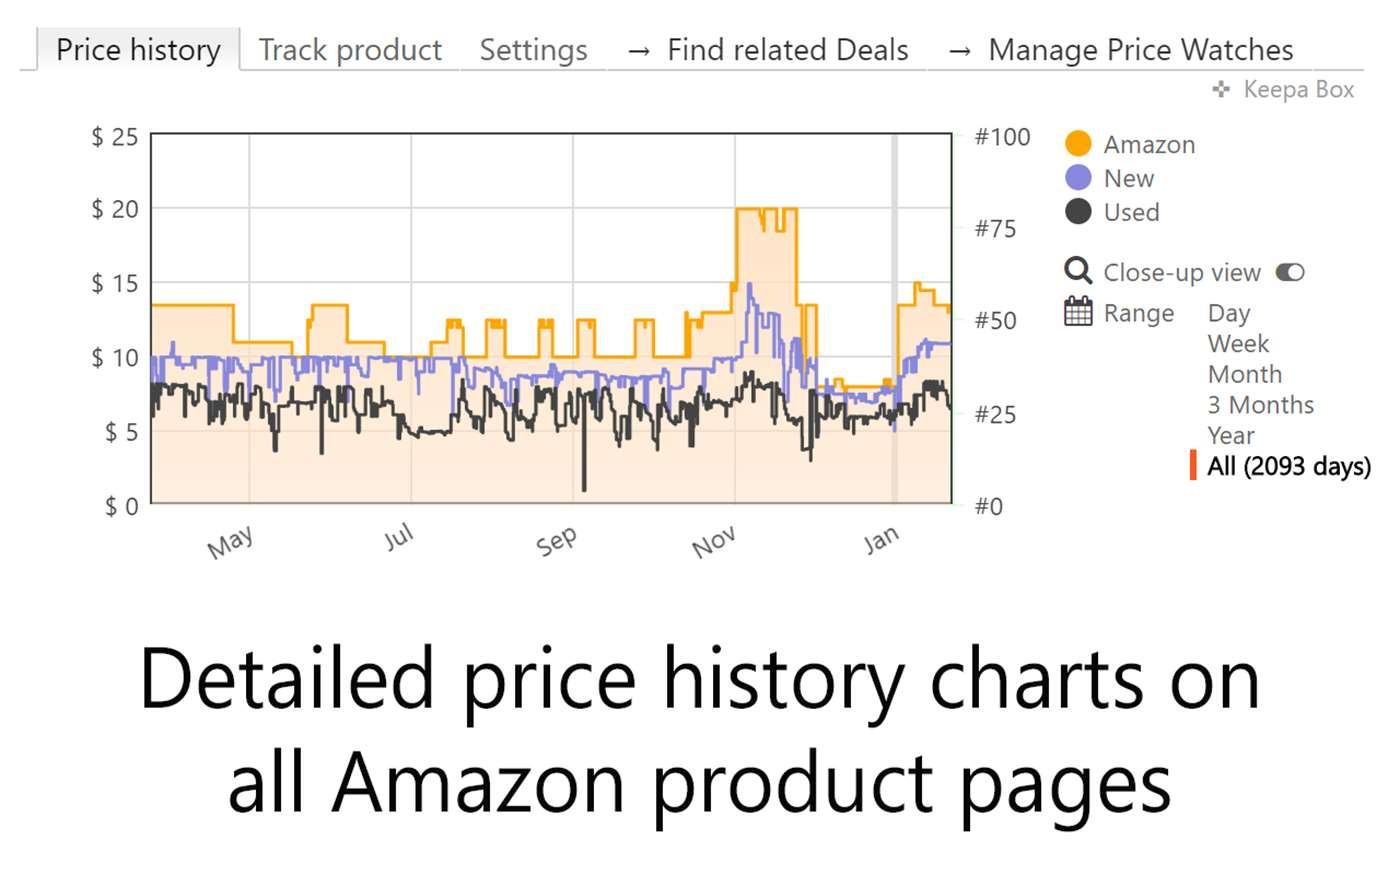 Keepa (Amazon price tracker app / chrome extension) - Free